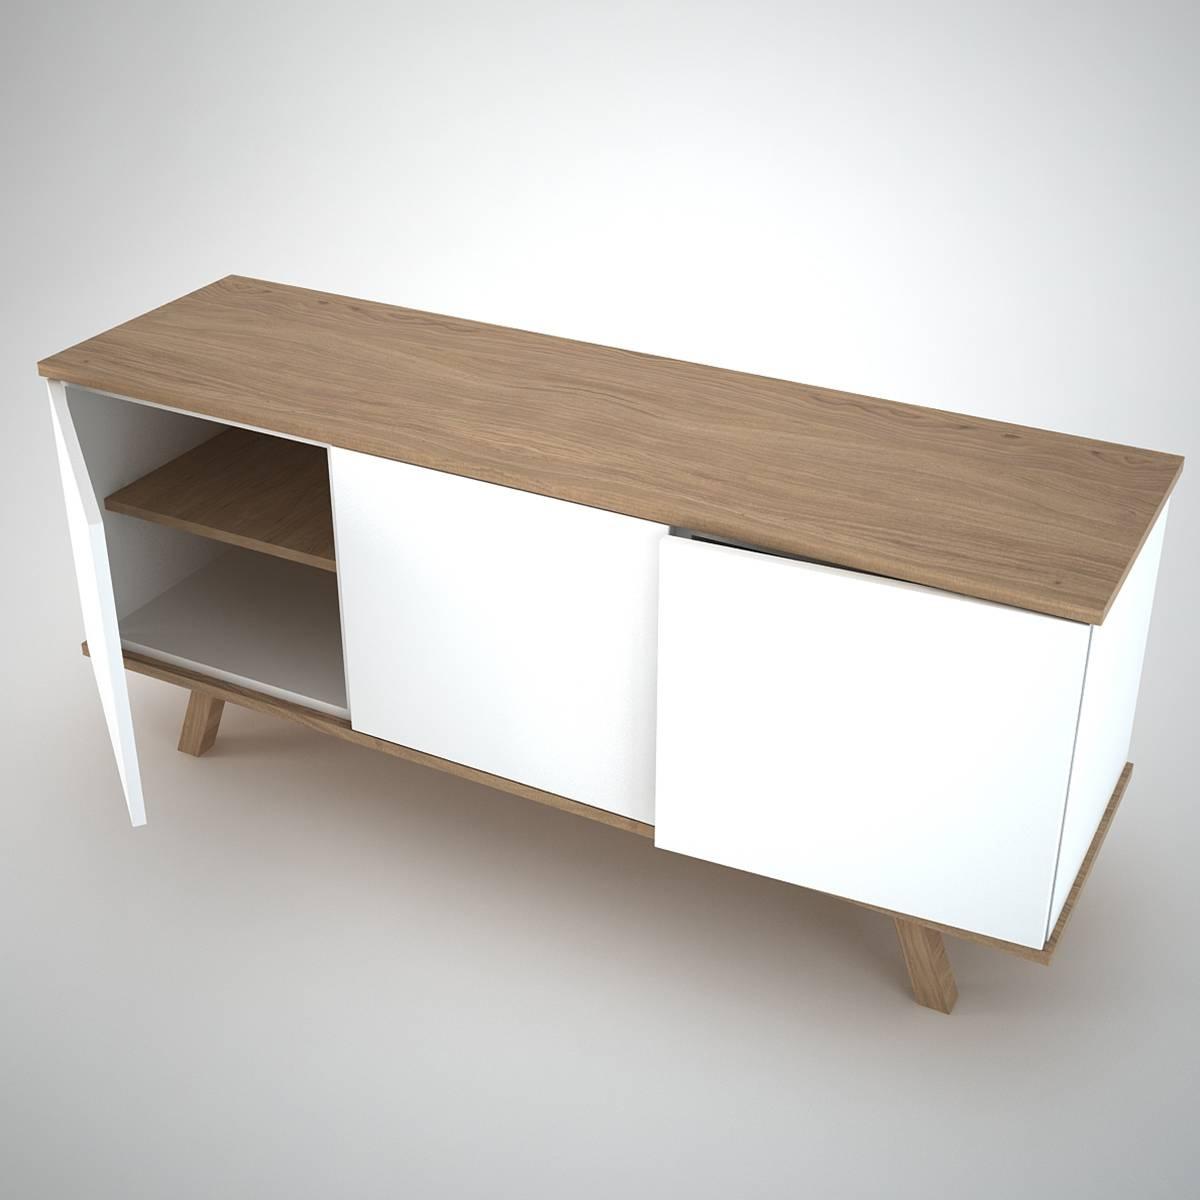 Ottawa Sideboard (3) White – Join Furniture Throughout Modern White Sideboards (View 4 of 15)